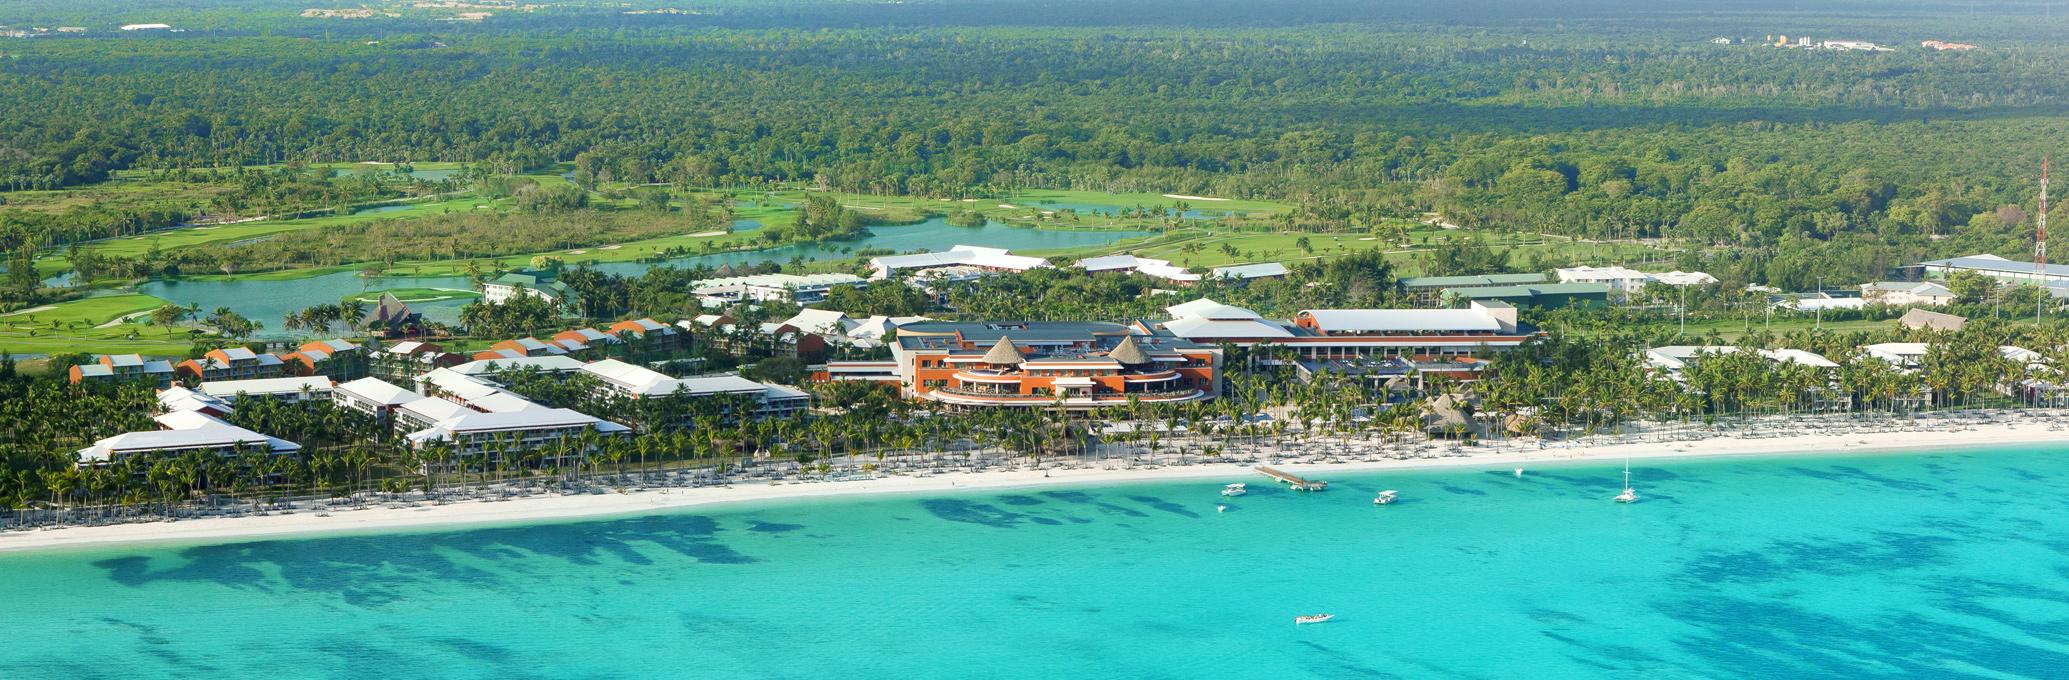 Barceló Bávaro Grand Resort: hotéis Praia Bavaro, Punta Cana